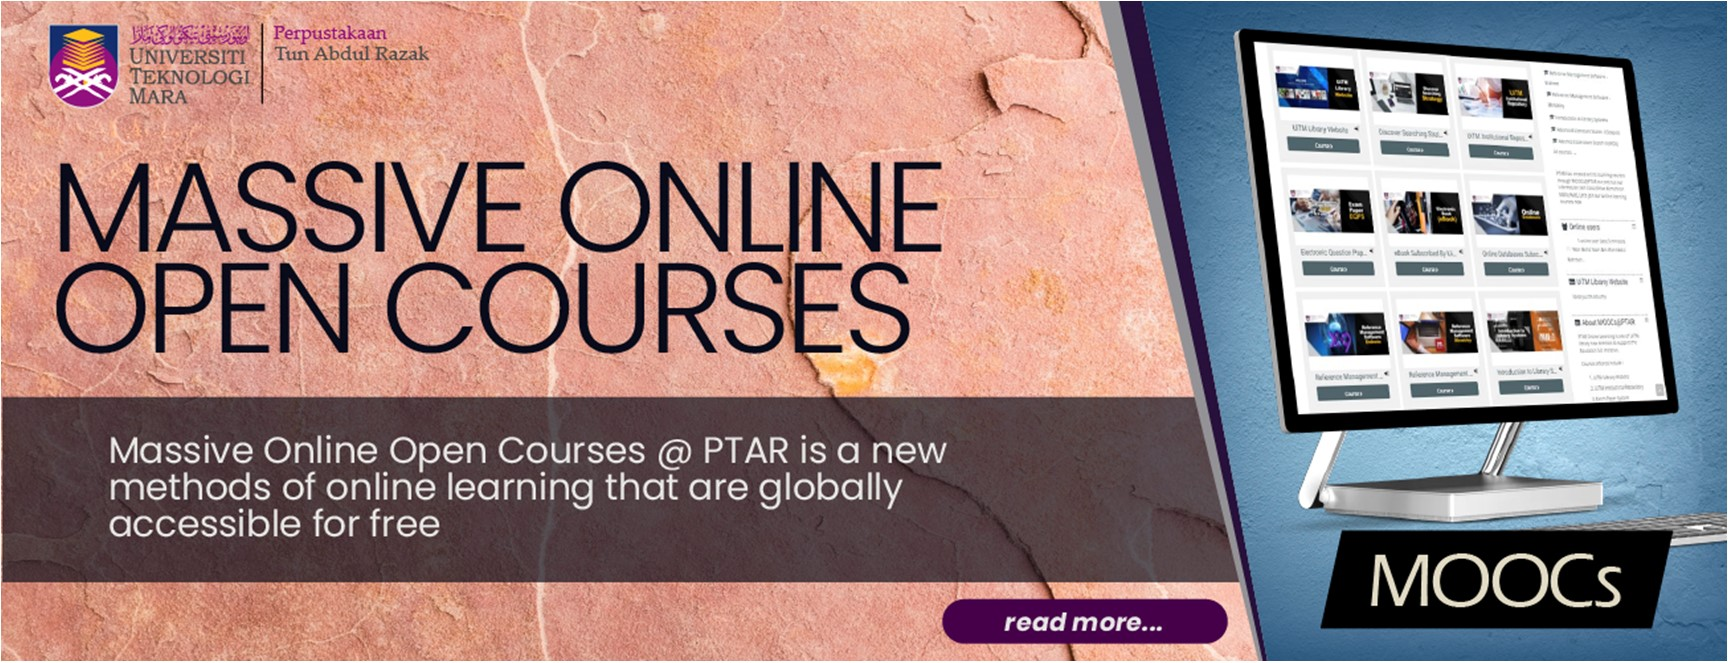 MOOCs@PTAR